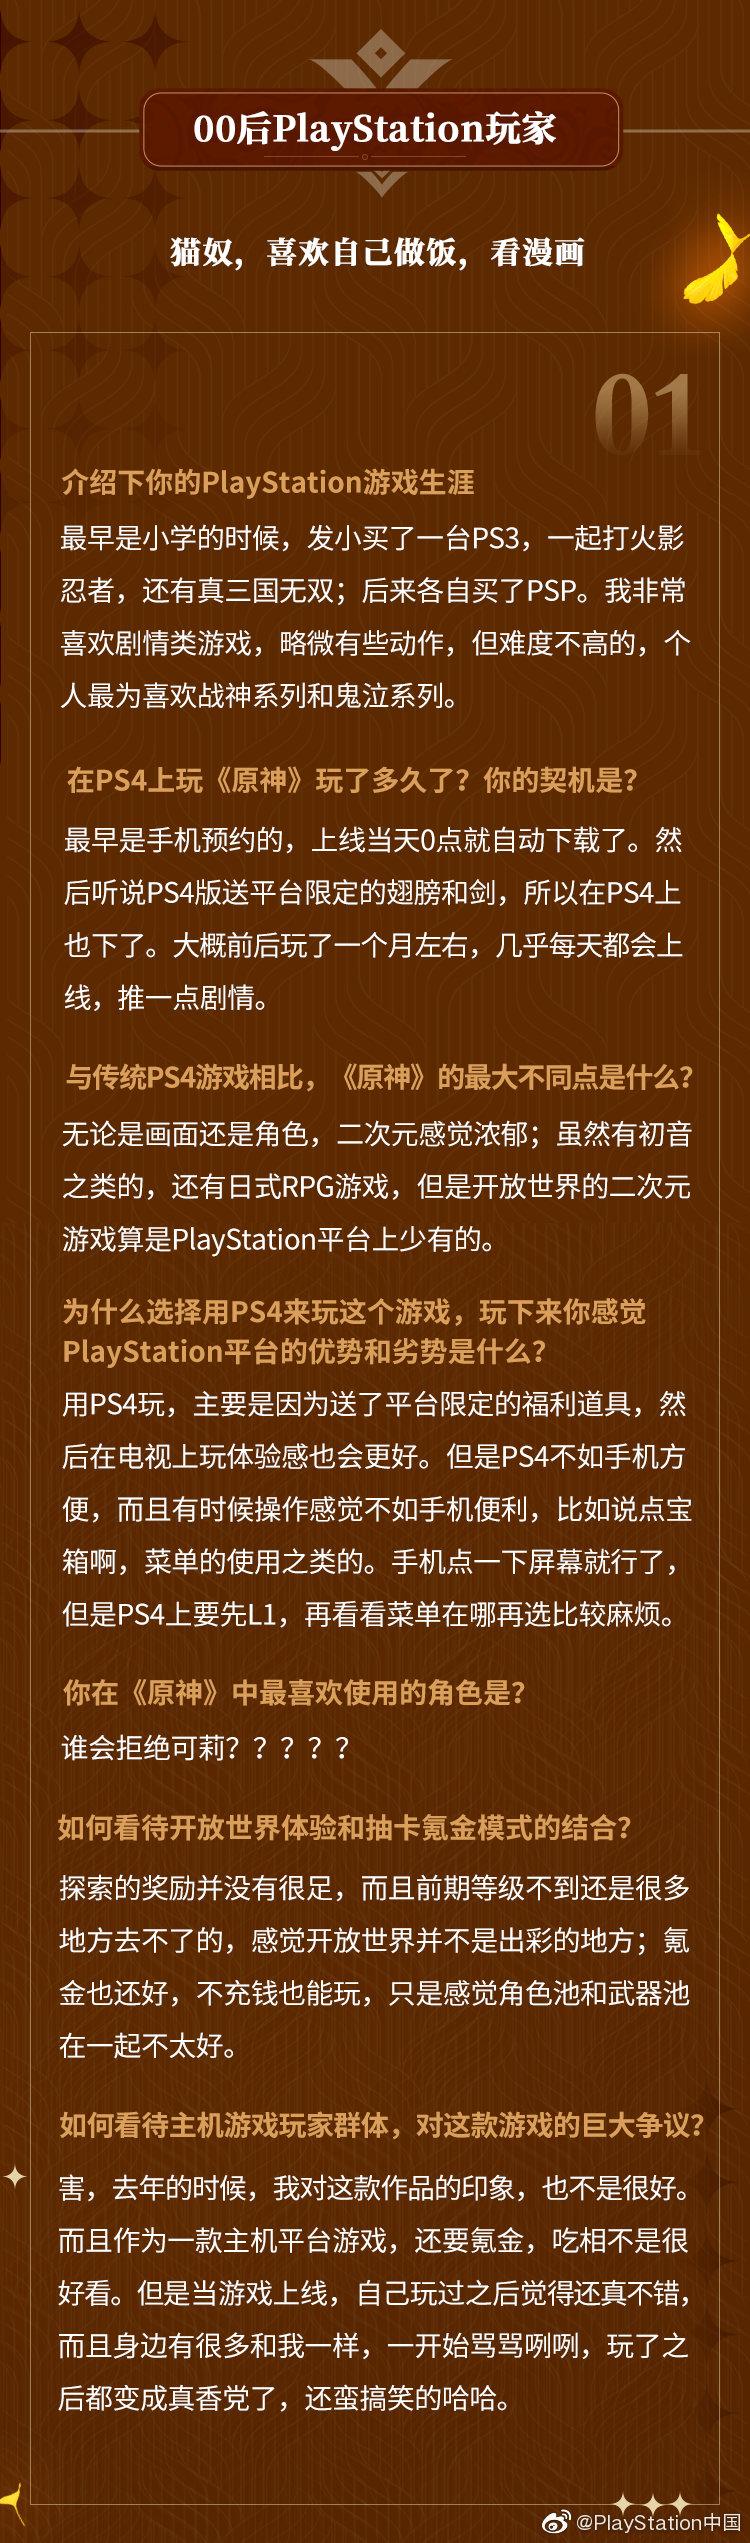 PlayStation中国官微晒00、90、80后玩家对《原神》评